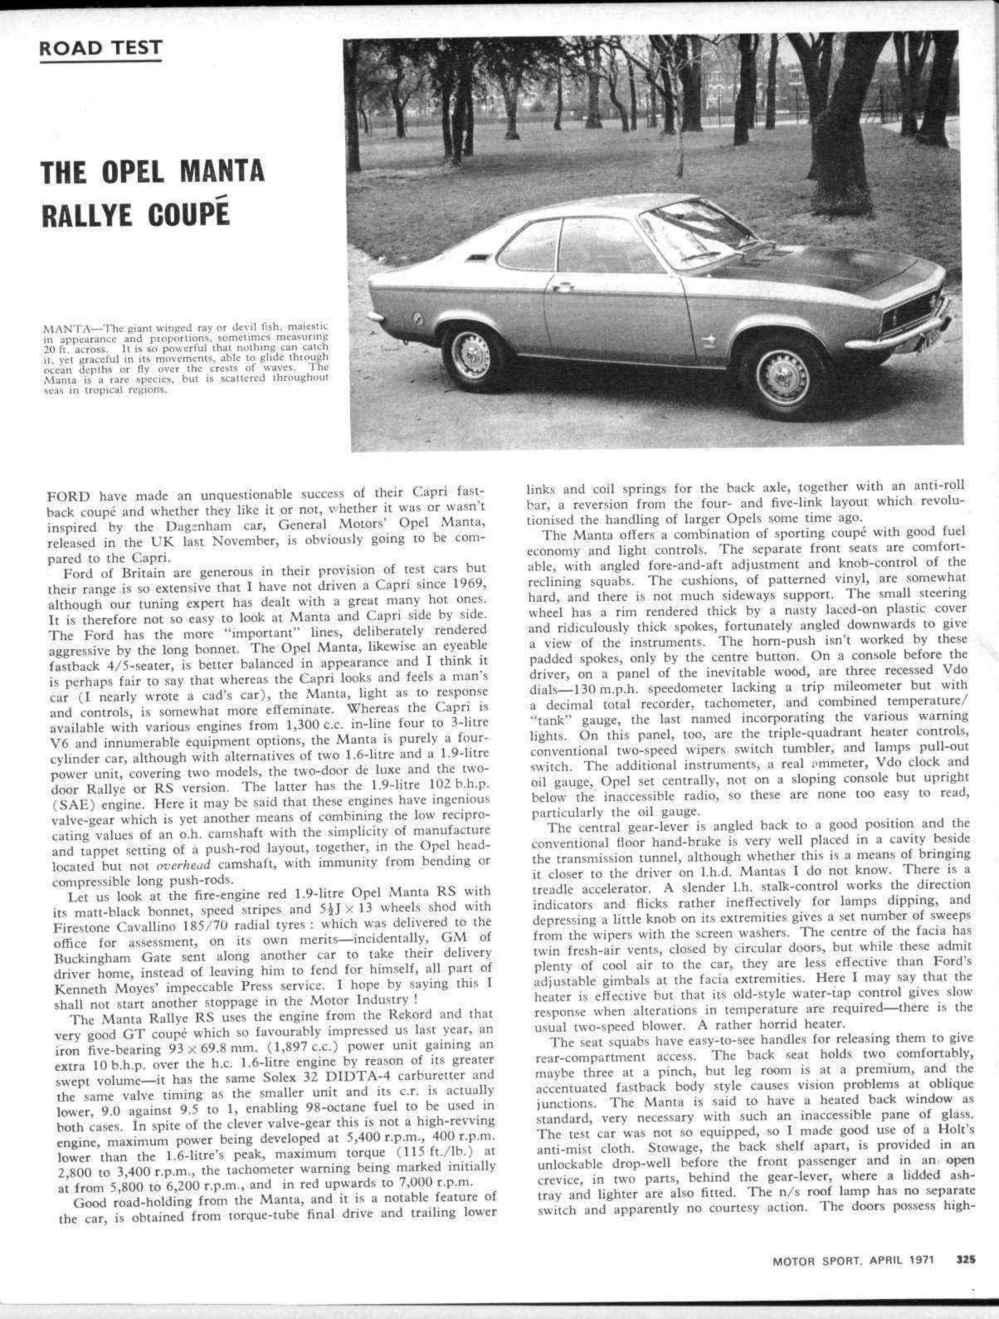 medium resolution of road test the opel manta rallye coup